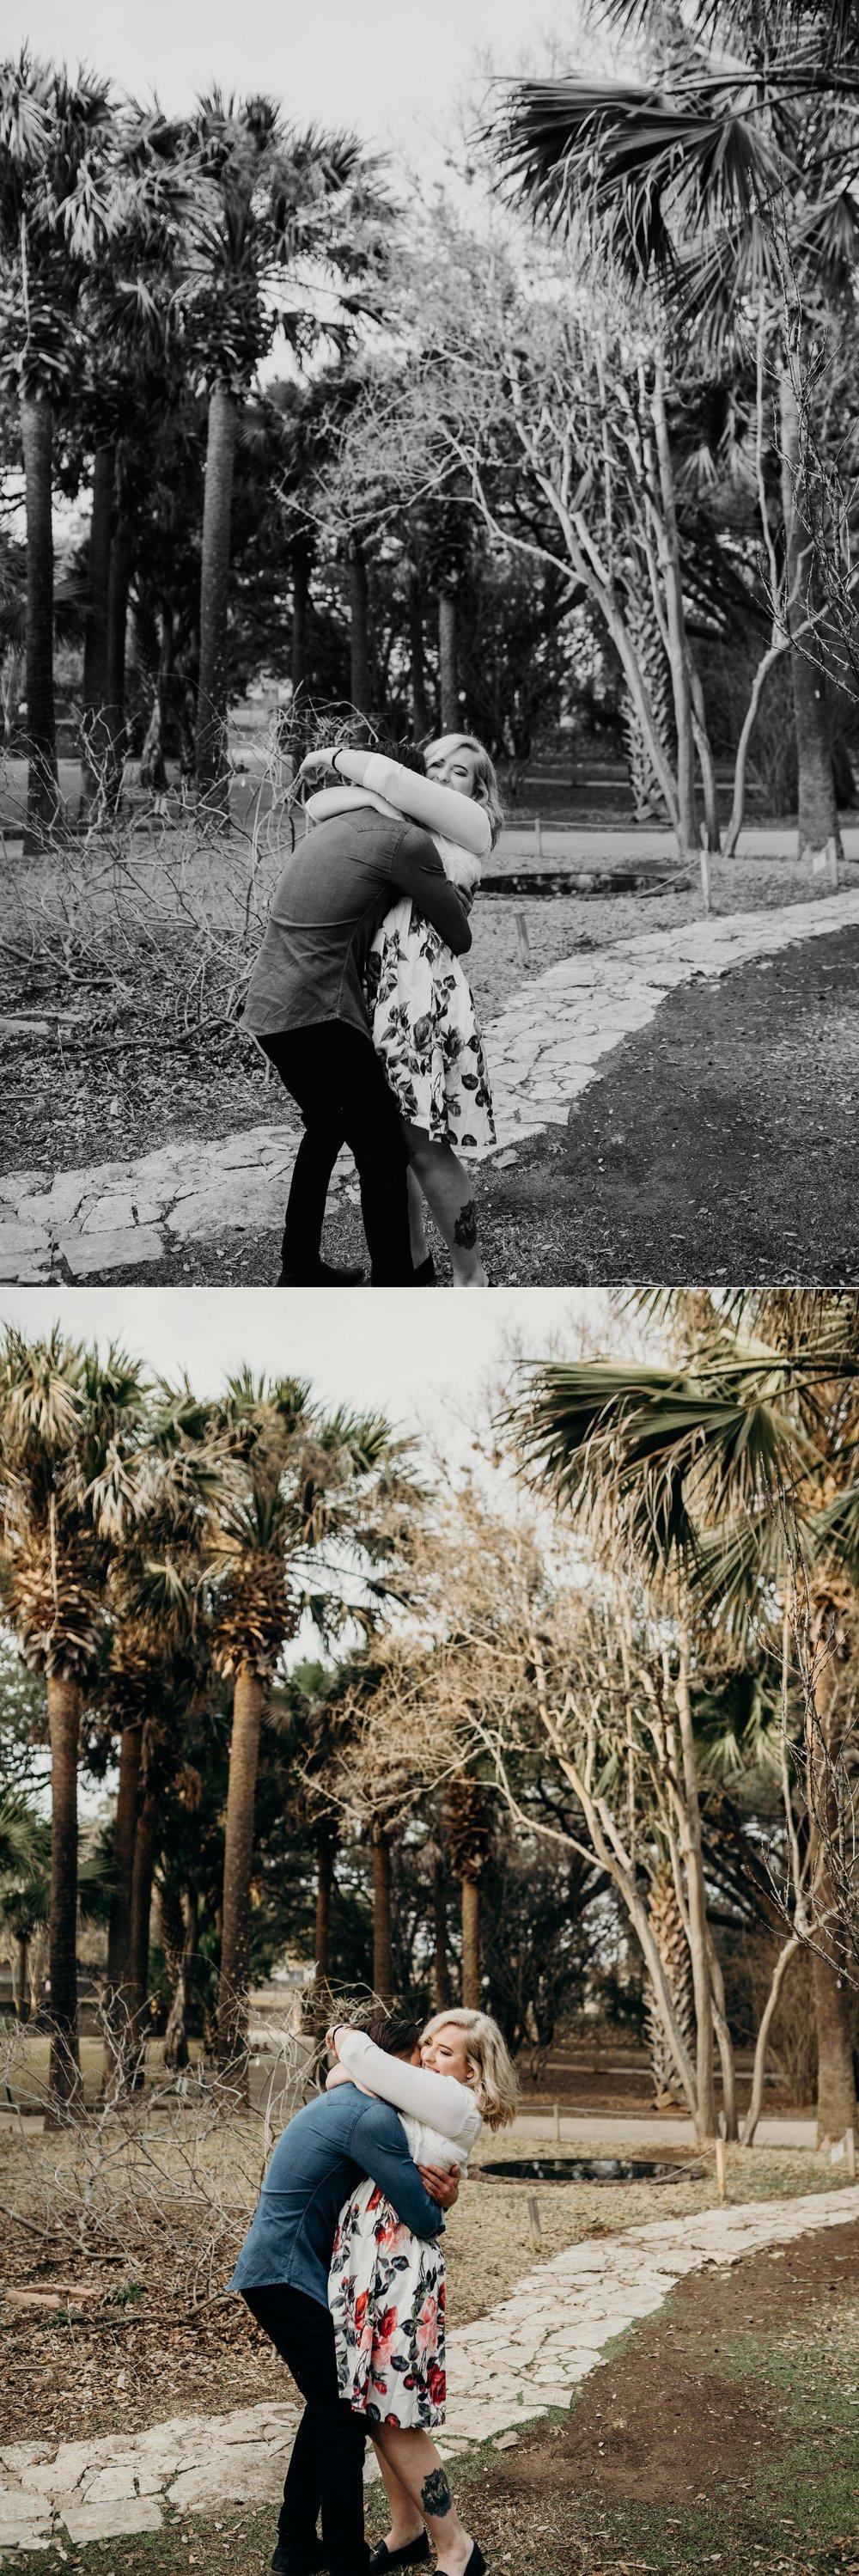 drew-andrew-texas-austin-minnesota-minneapolis-wedding-photographer-destination-elopement-intimate-adventurous_0103.jpg